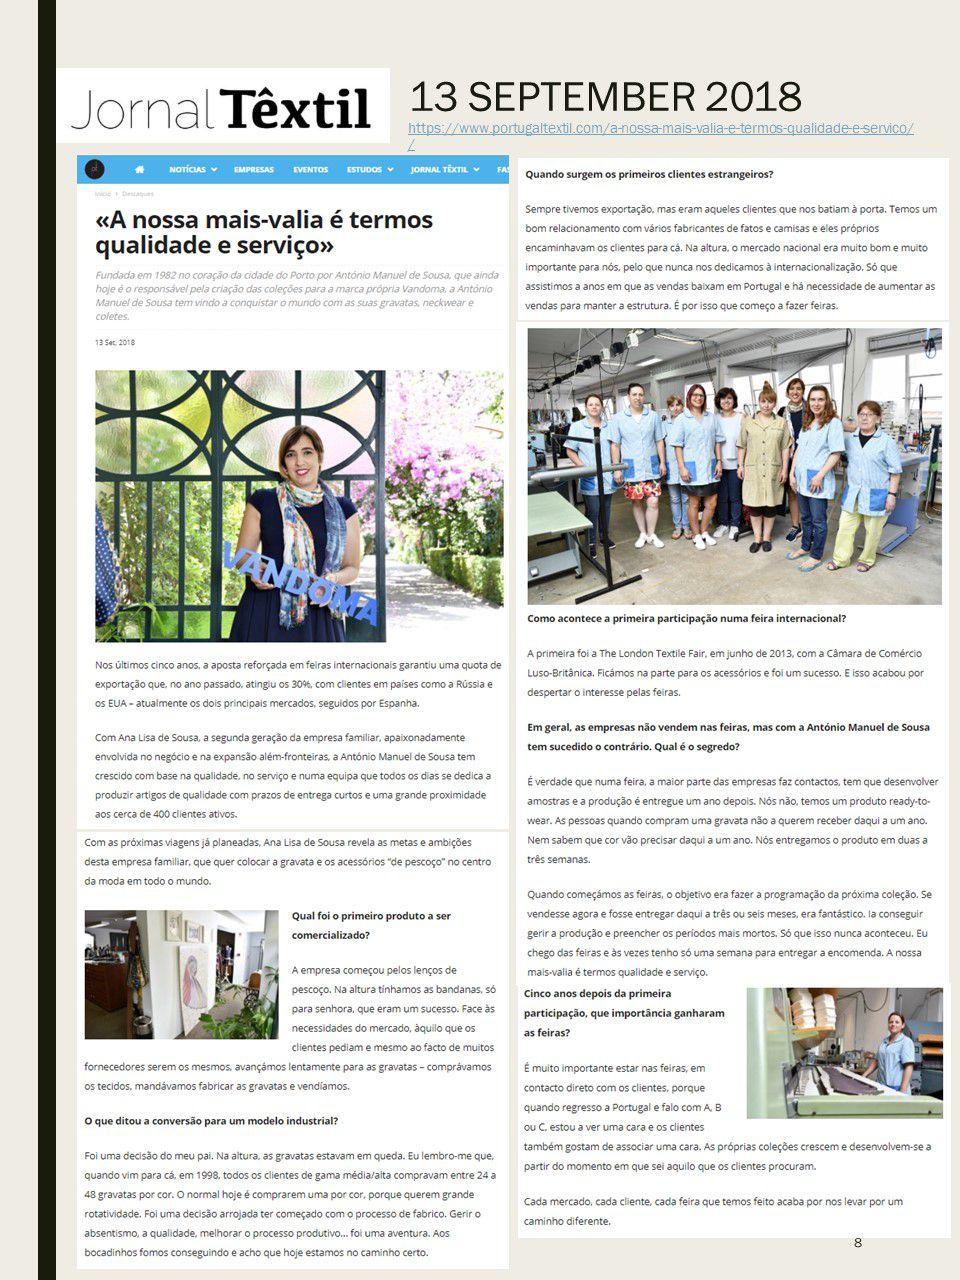 2bf3b-jornal-textil-13-setembro-part-i